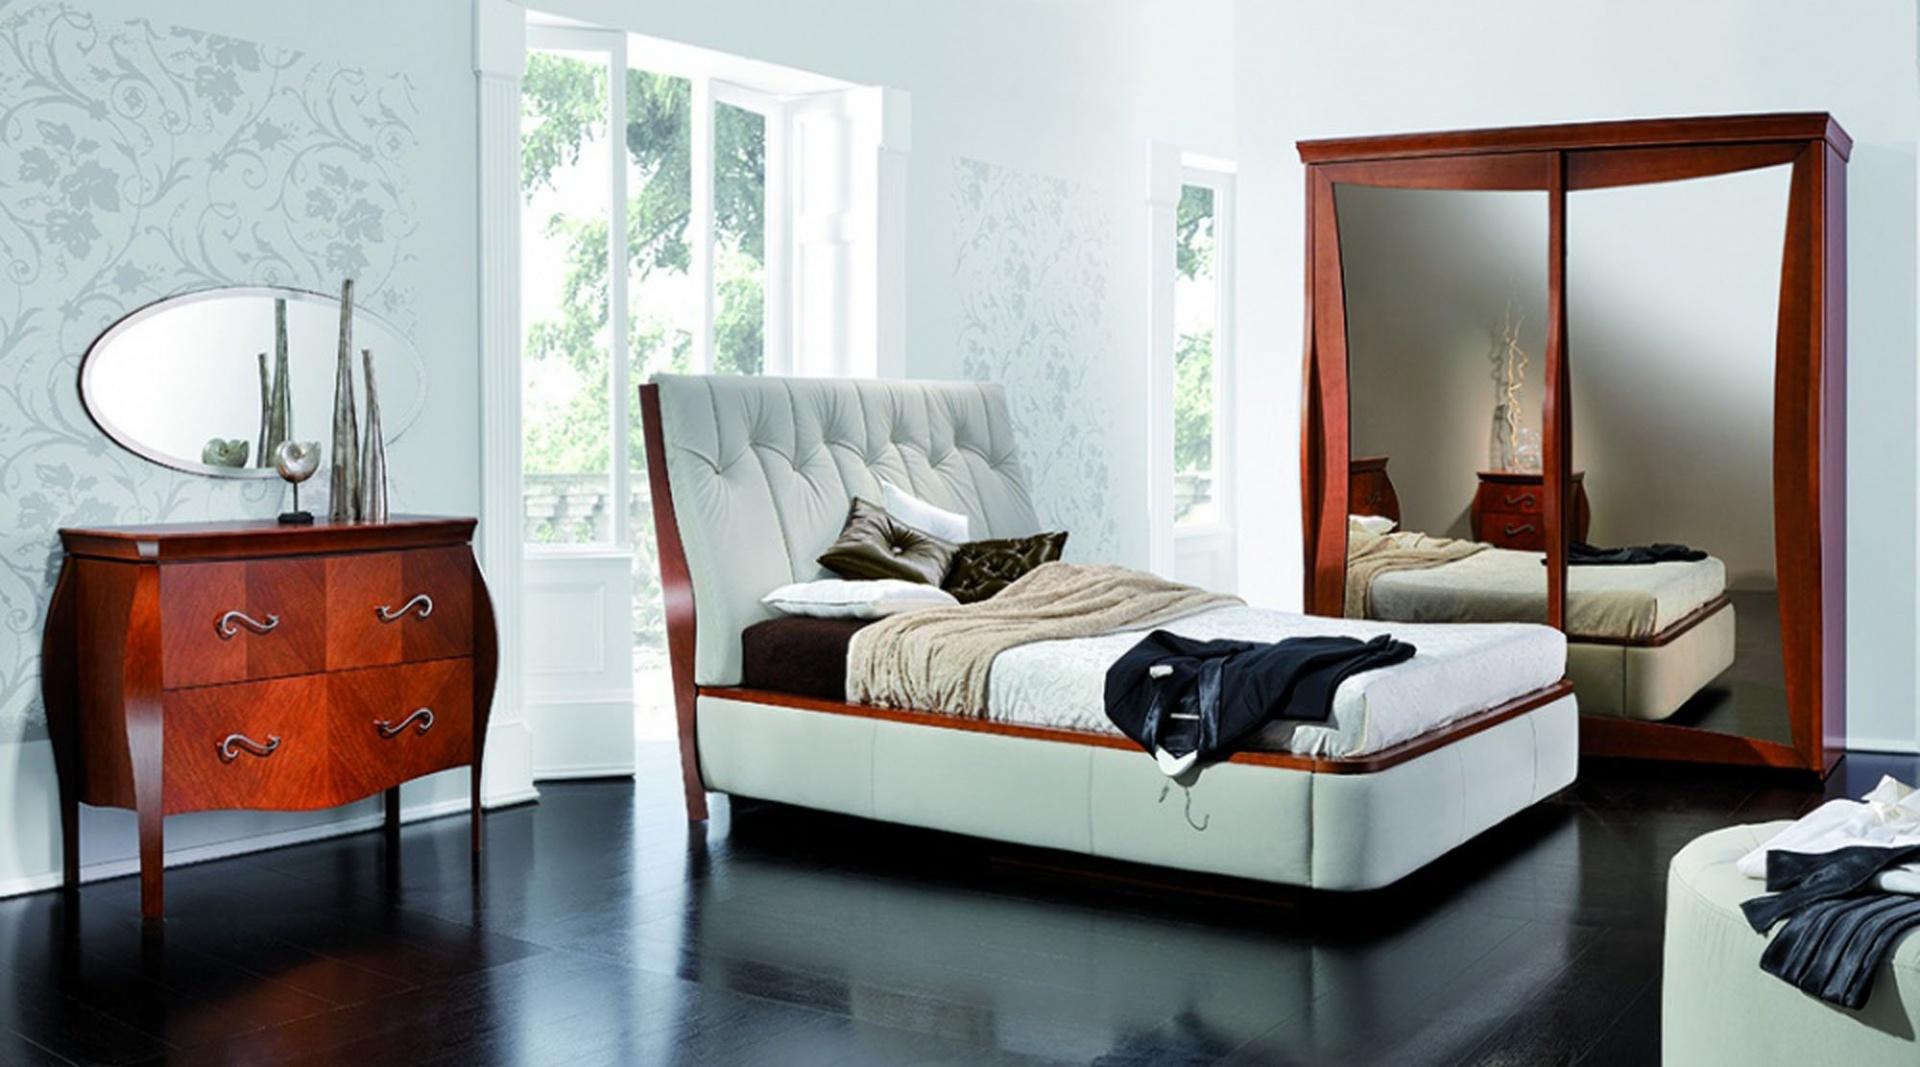 Harmony спальня польская IM187